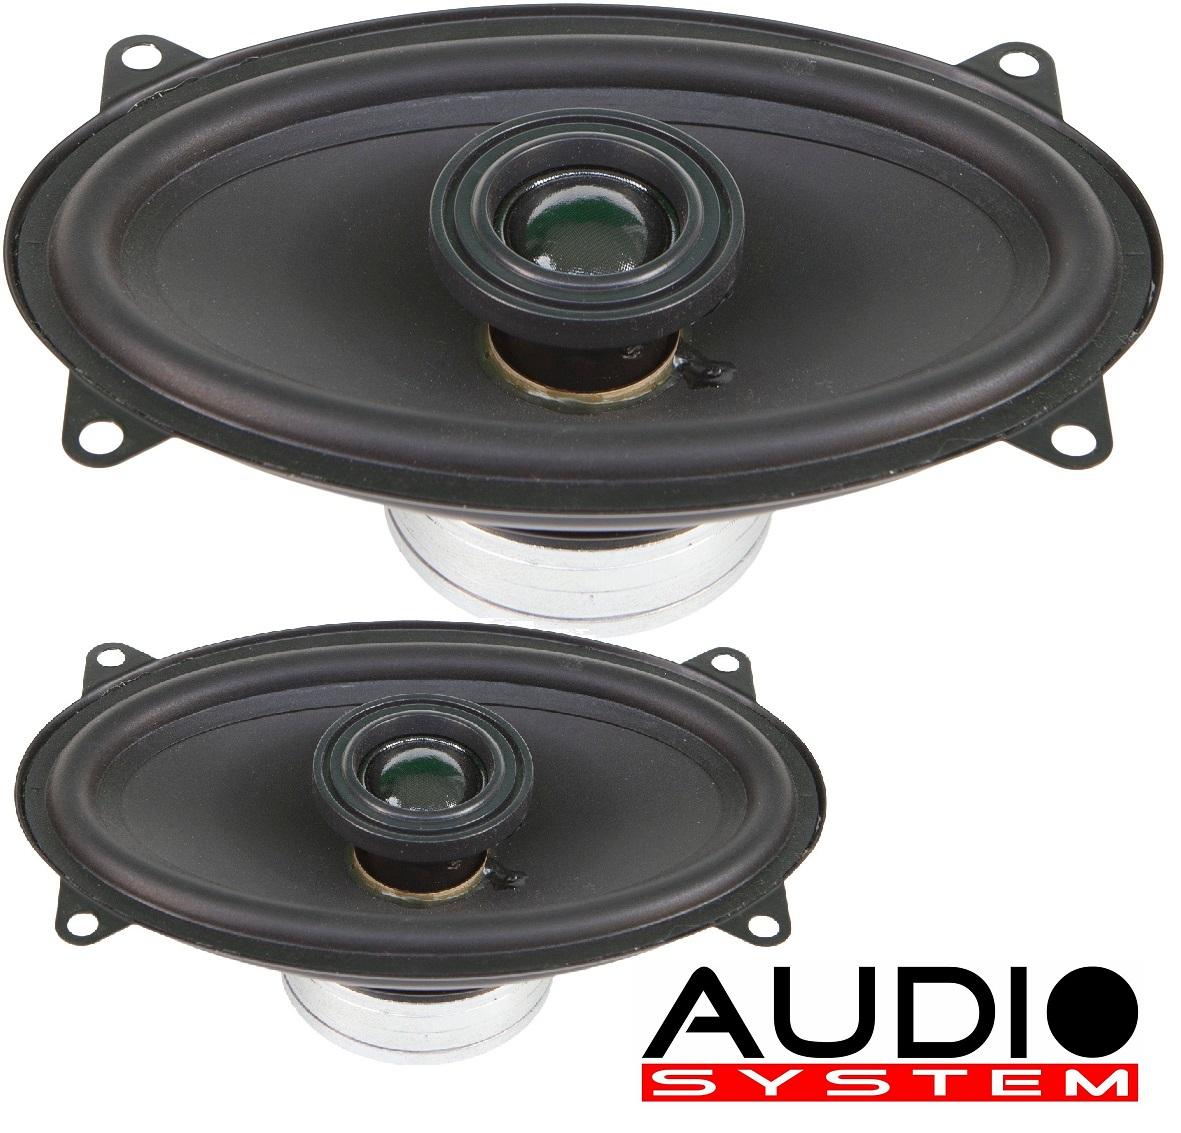 Audio System XC 406 EVO X-SERIES Neodym Coaxial System 4x6 , 125 Watt 1 Paar